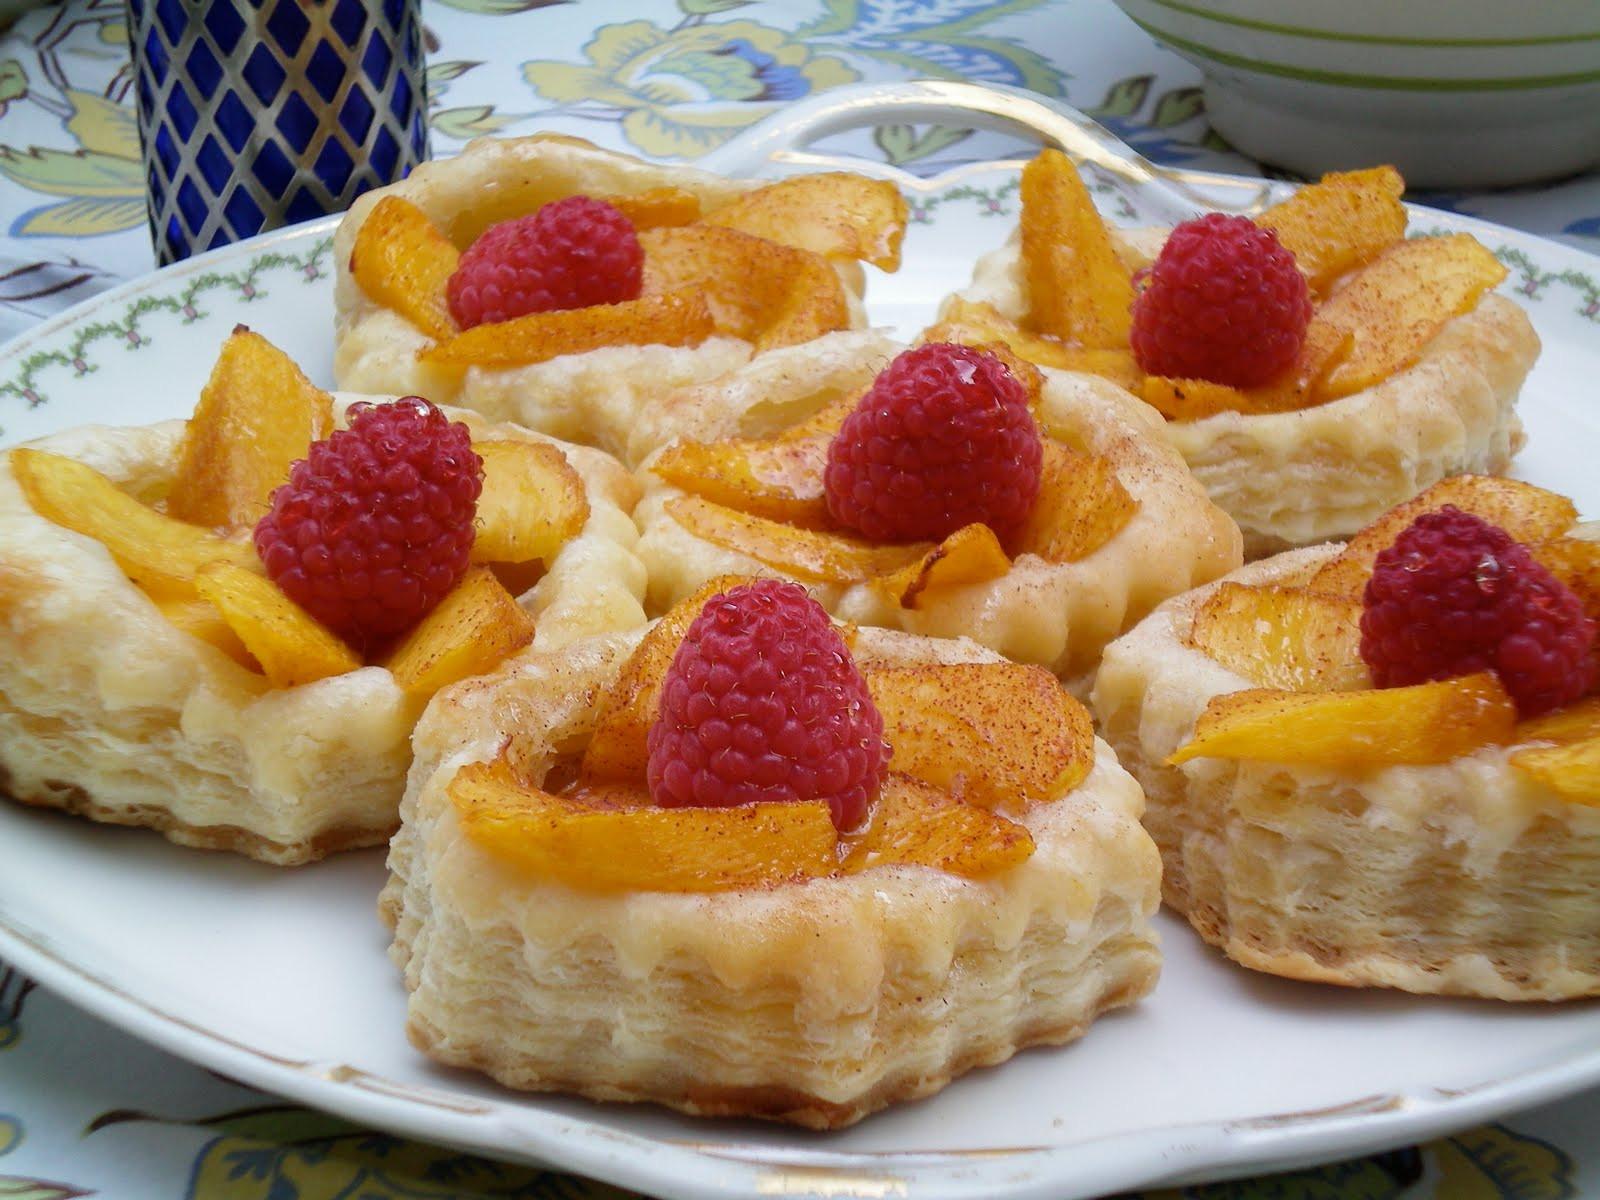 Spanish Custard Dessert  Recreation And Leisure Spanish Almond Custard Tort Recipe